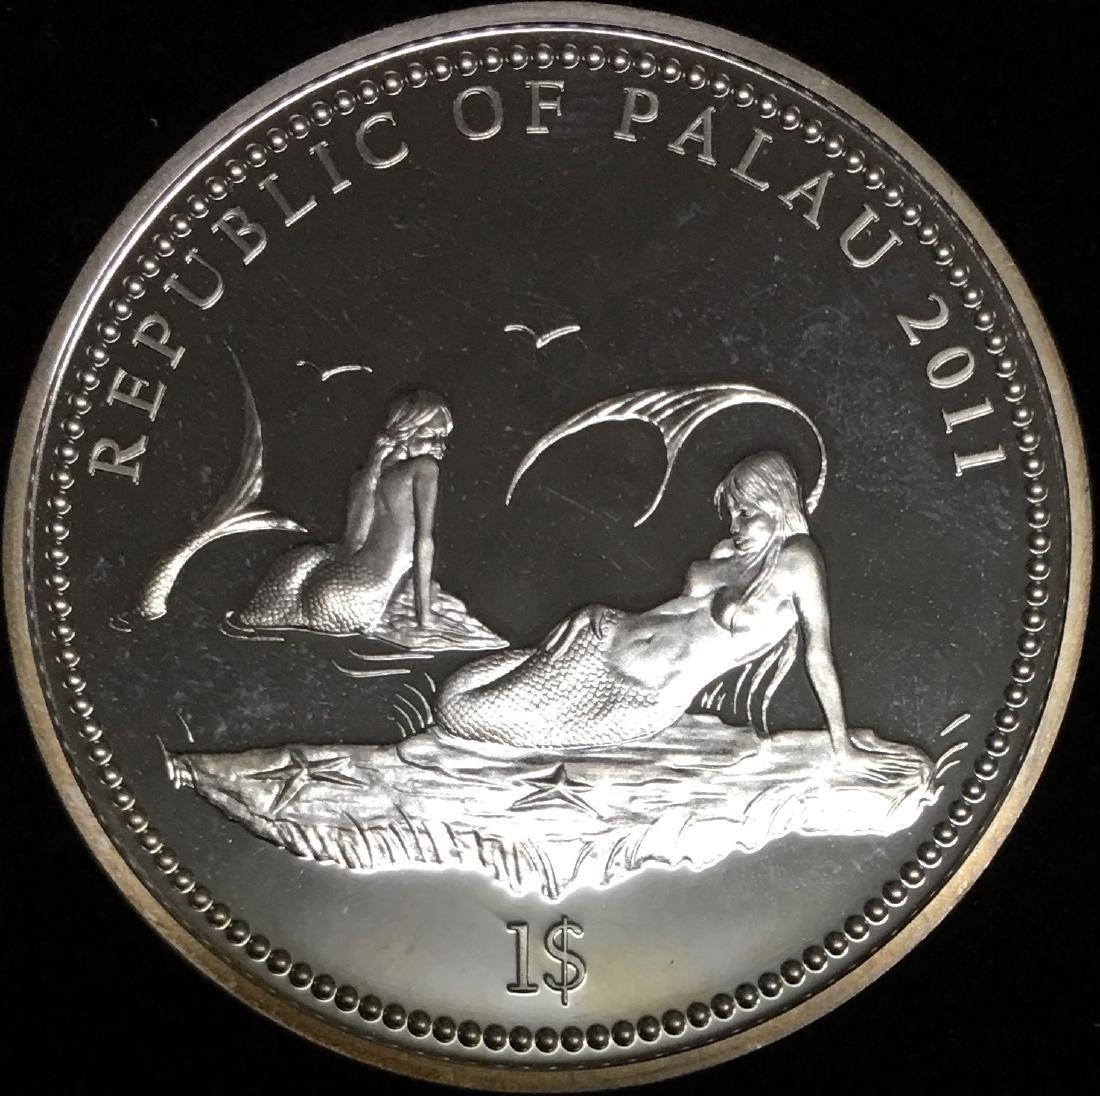 2011 $1 Republic of Palau Silver ANEMONEFISH Marina